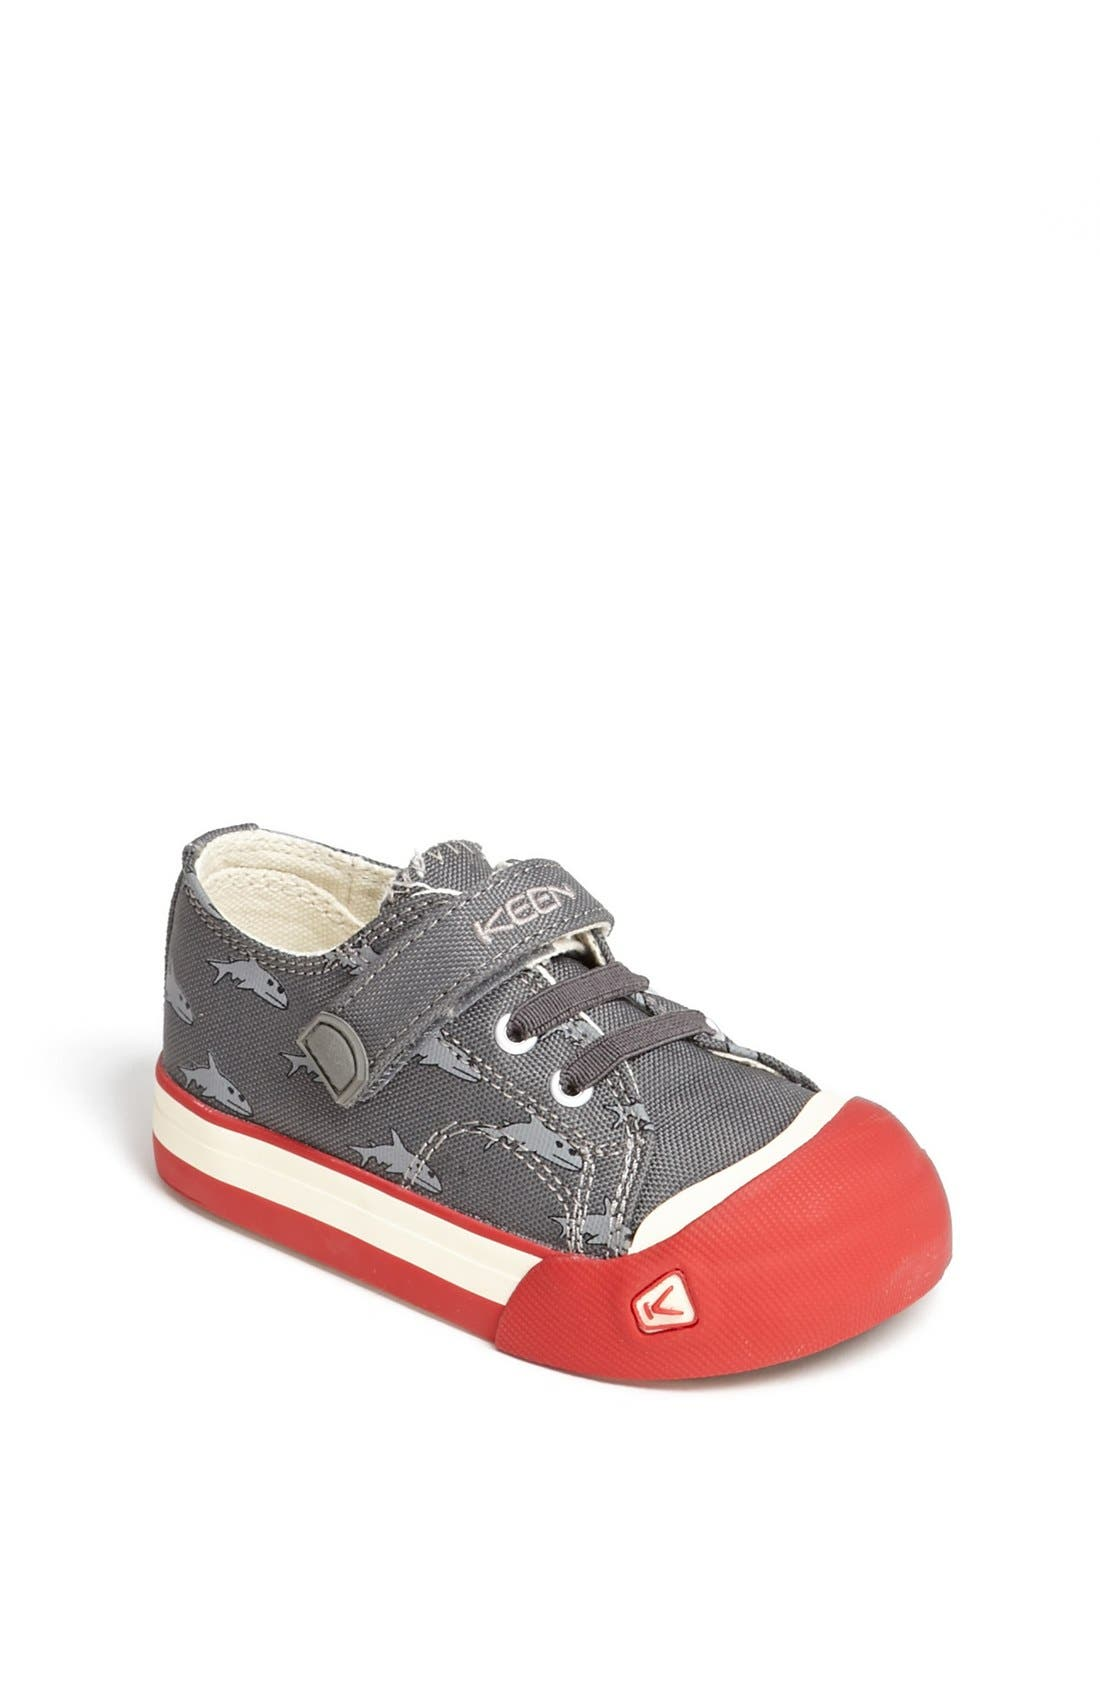 Alternate Image 1 Selected - Keen 'Coronado' Print Sneaker (Baby, Walker, Toddler, Little Kids)